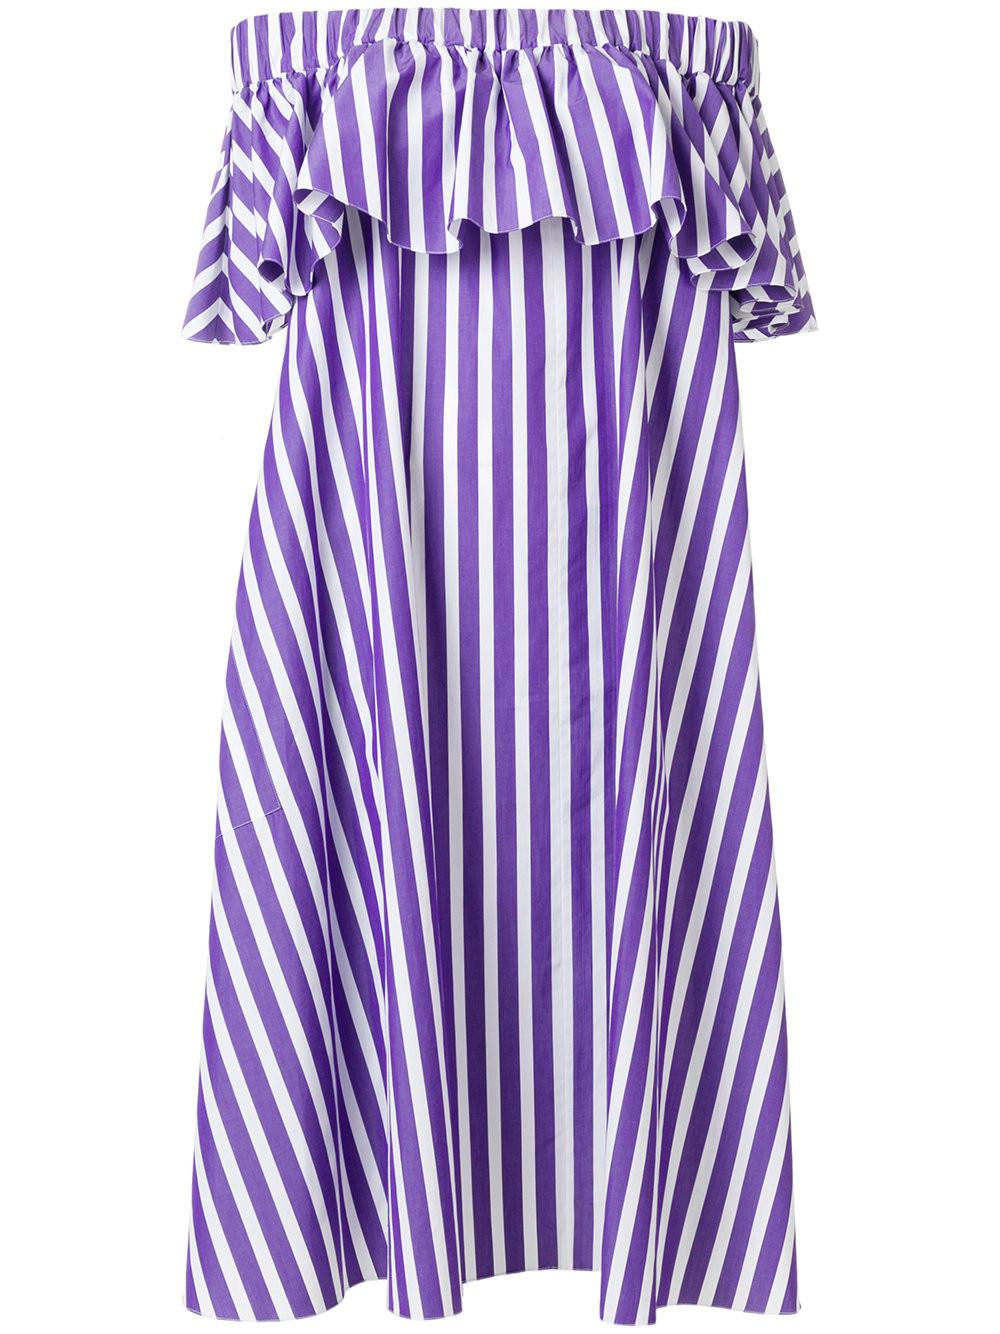 160471f81a7f0 Maison Rabih Kayrouz Purple Striped Off-shoulder Dress in Purple ...